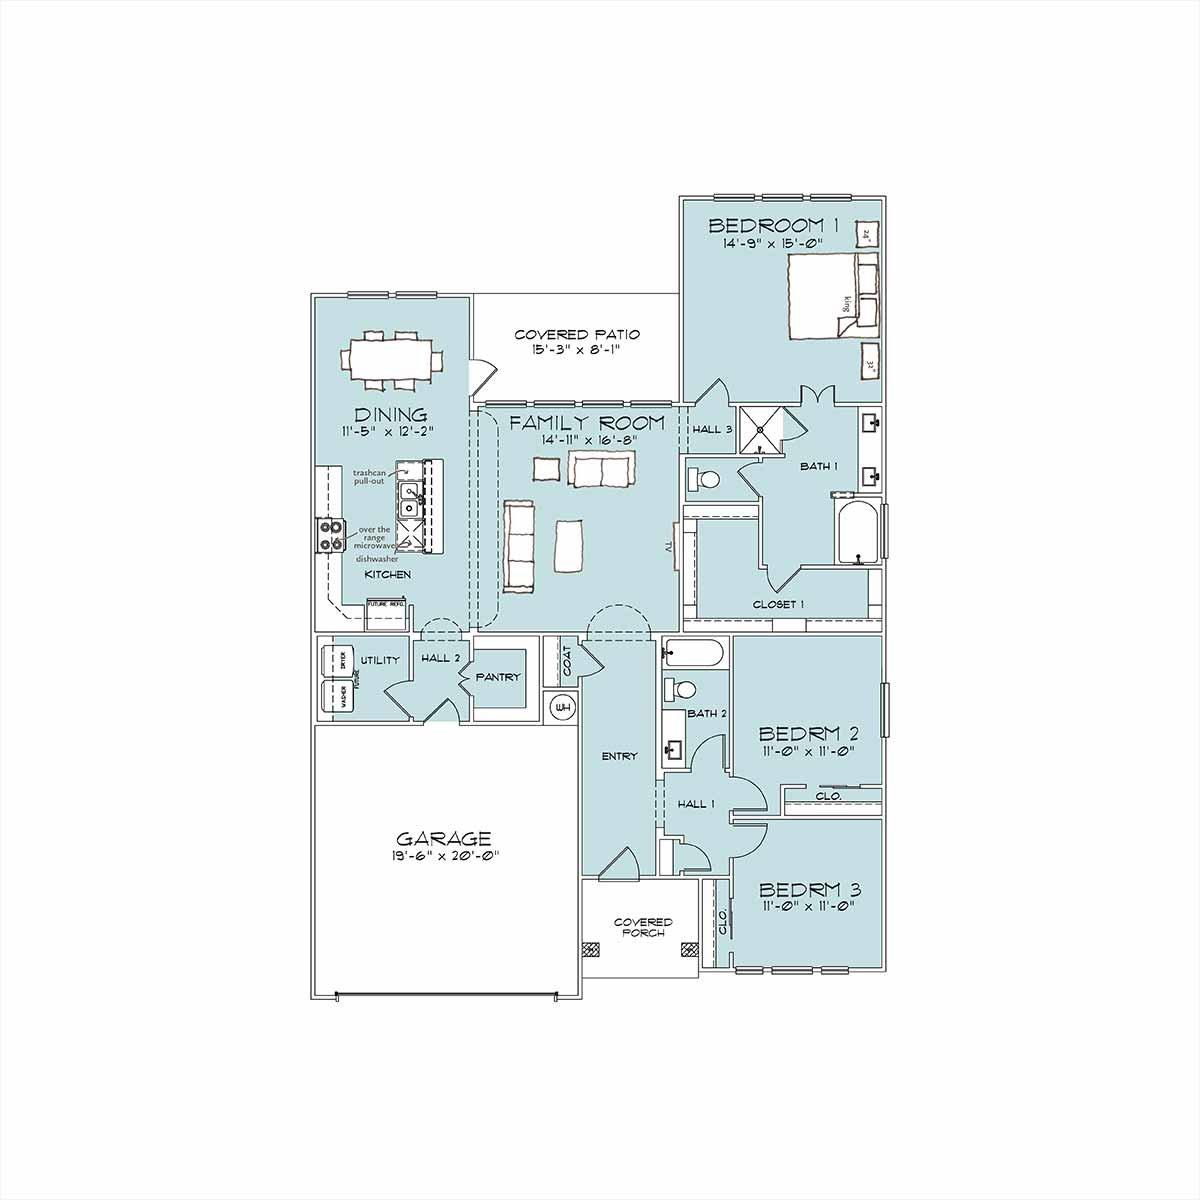 Morgan Floor Plan by Omega Builders in Wyndham Hill